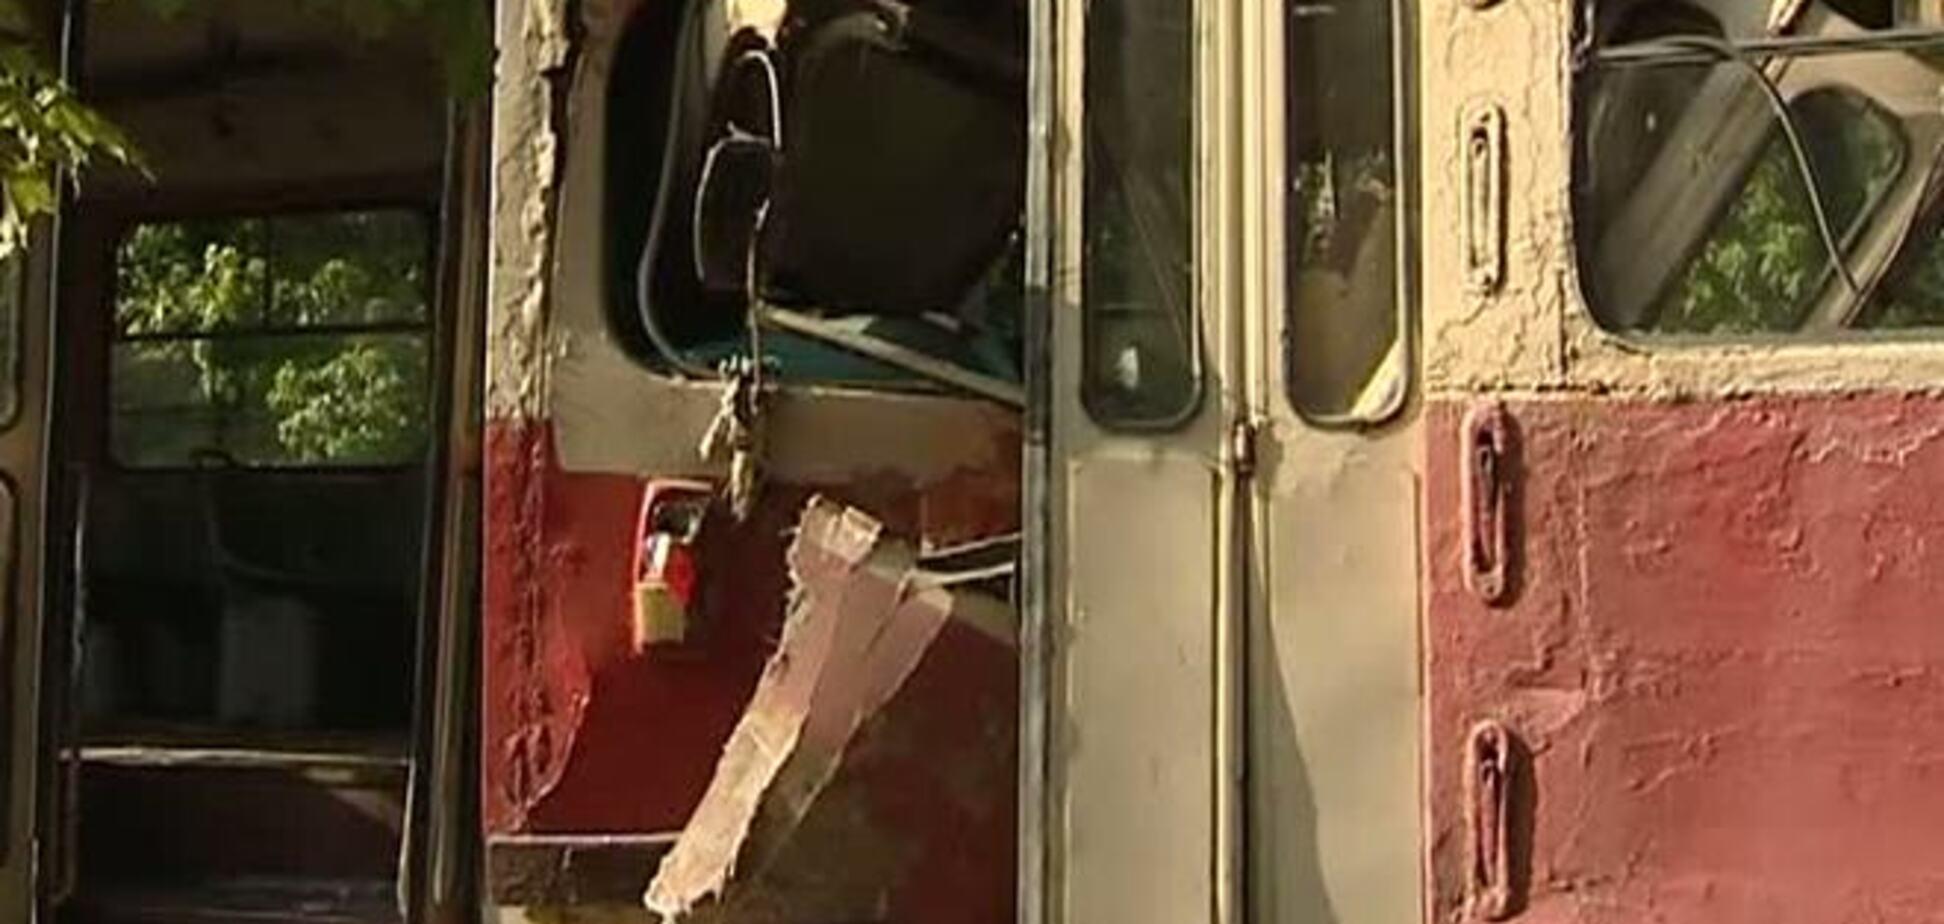 В Харькове столкнулись два трамвая: 12 пострадавших